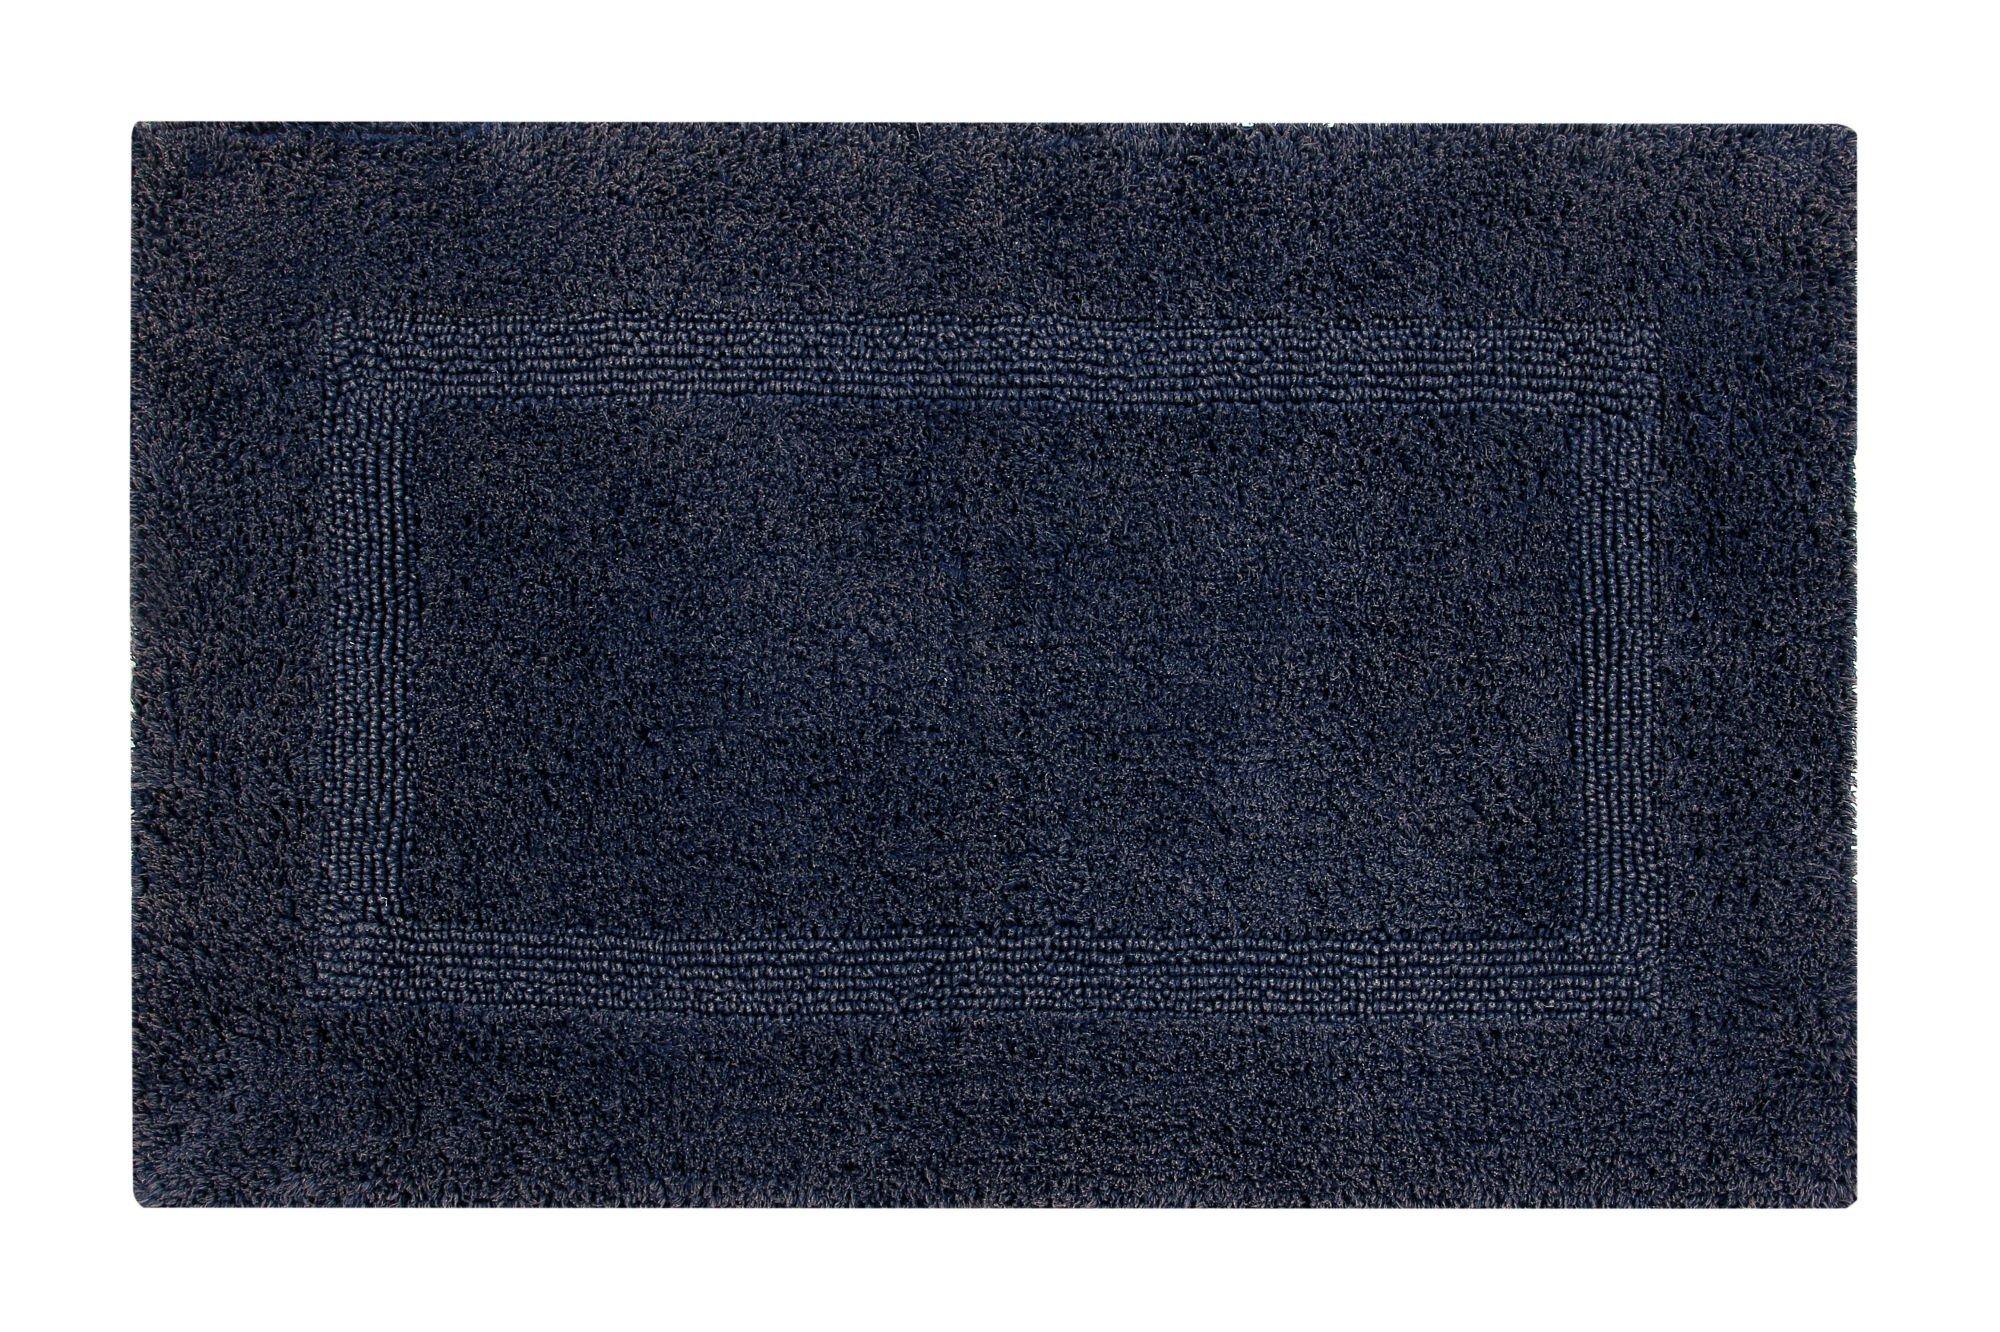 Better Trends/ Pan Overseas BARS2440NV Racine Stonewash 100% Cotton Bath Mat, 24'' x 40'', Navy